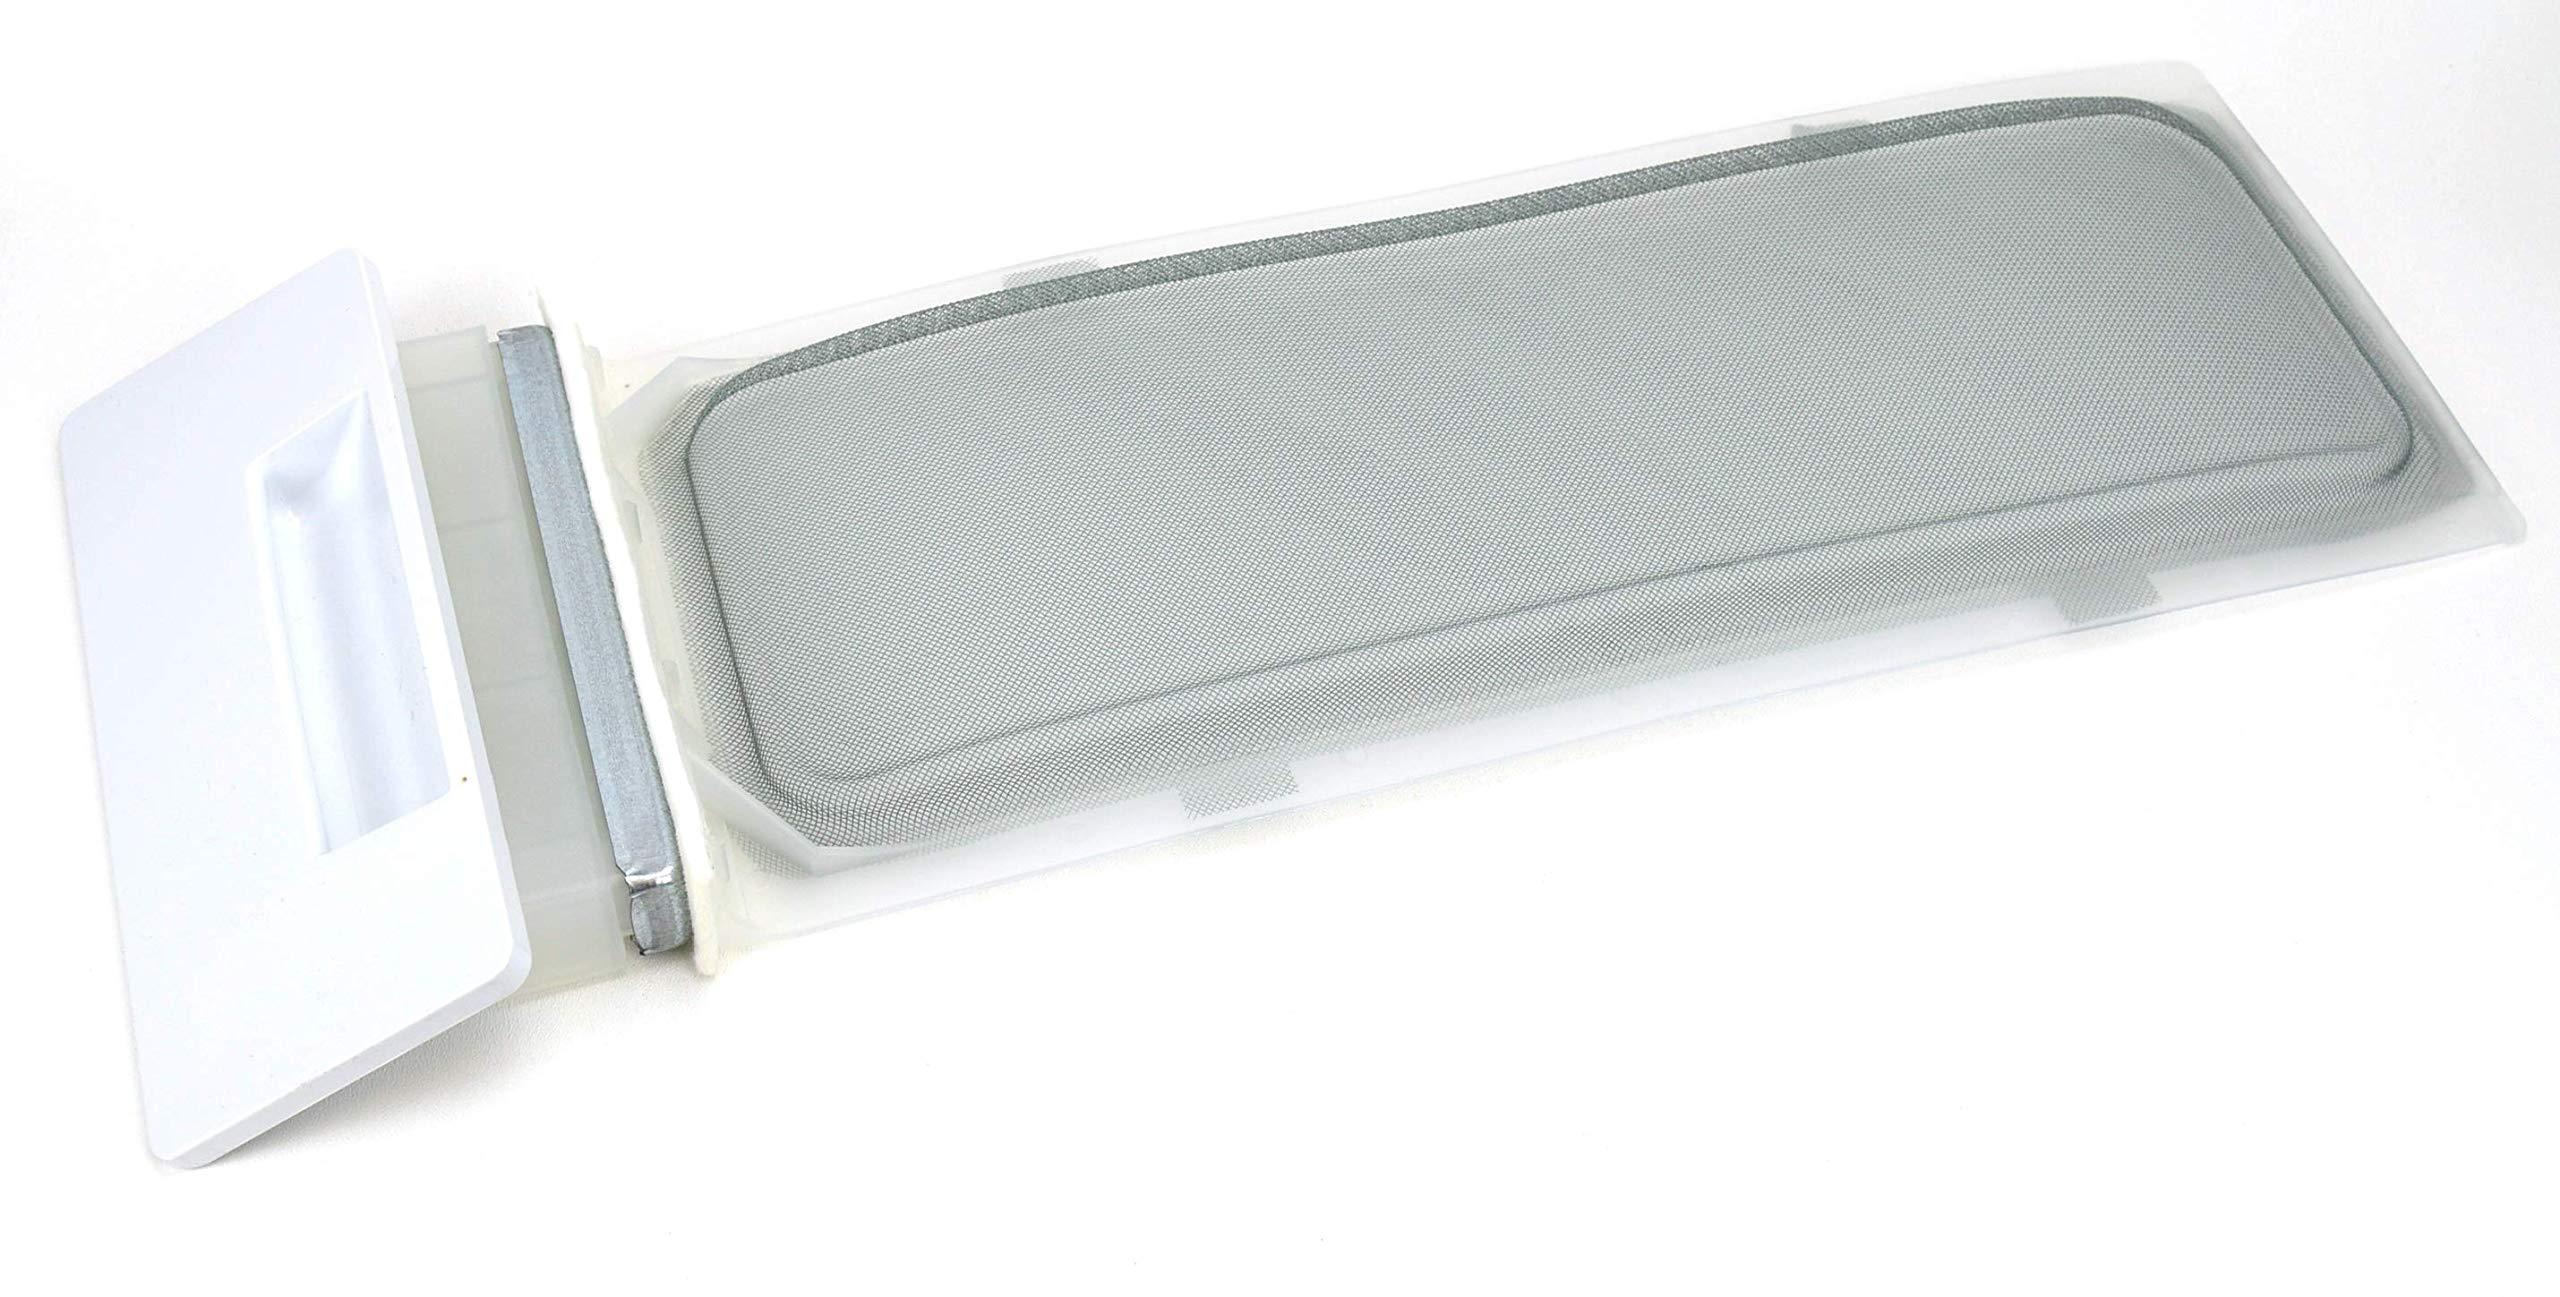 AZAP W10717210 Dryer Lint Screen Filter 8557882 fits Whirlpool Kenmore Estate WPW10717210